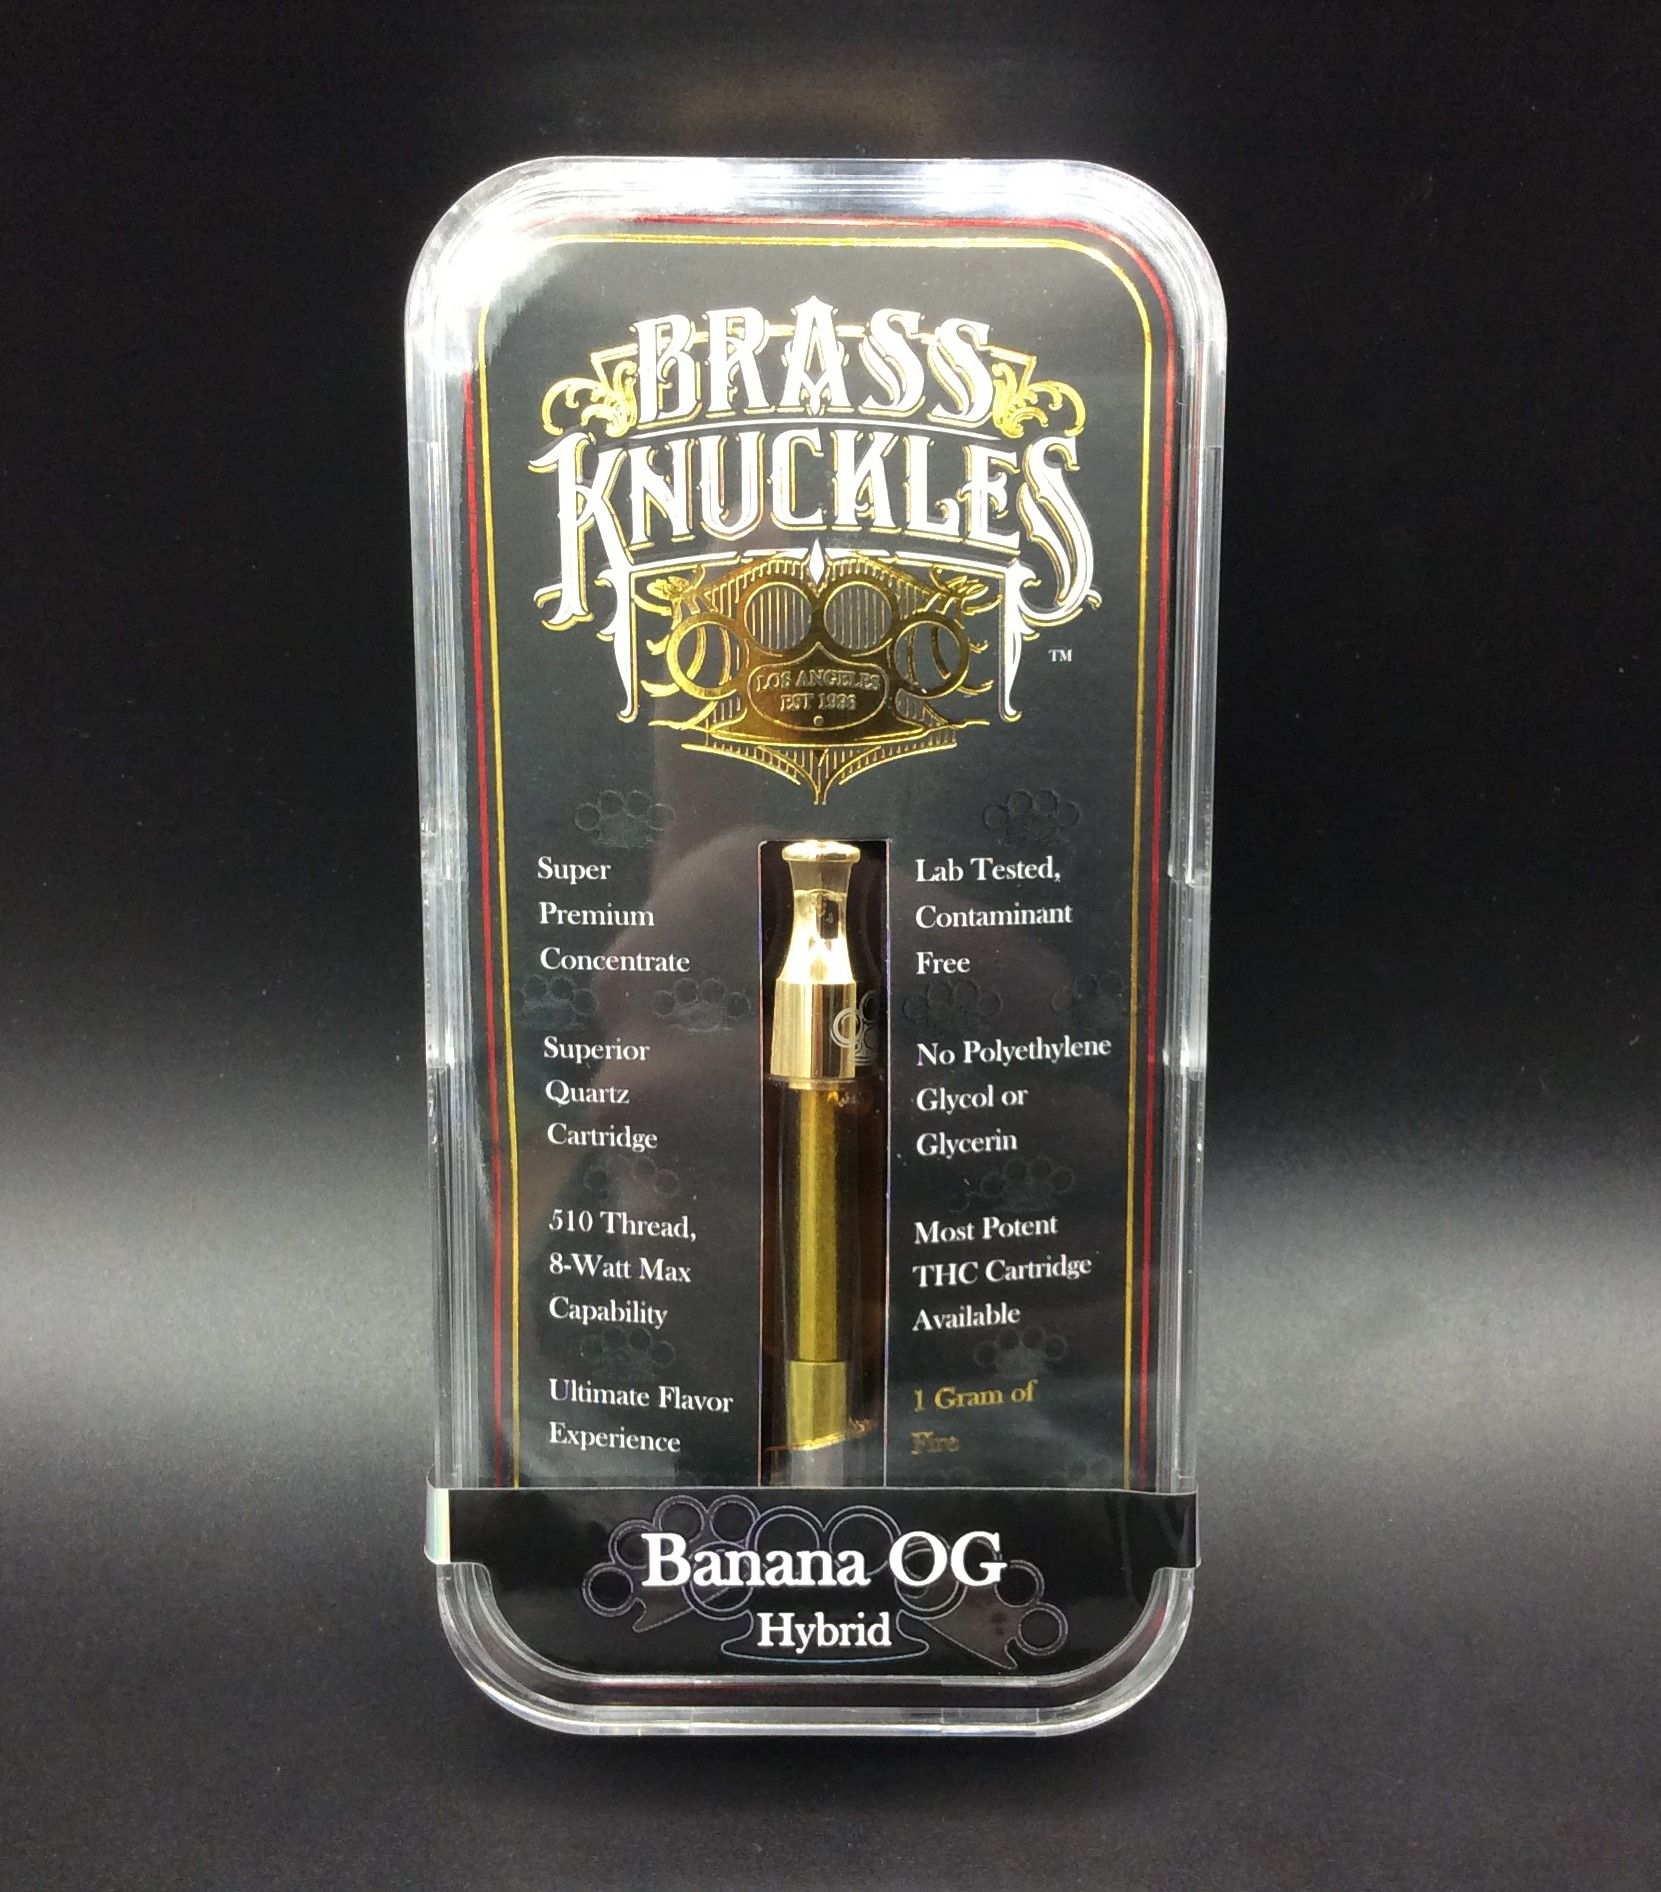 Banana O.G. 1g Vape Cartridge by Brass Knuckles